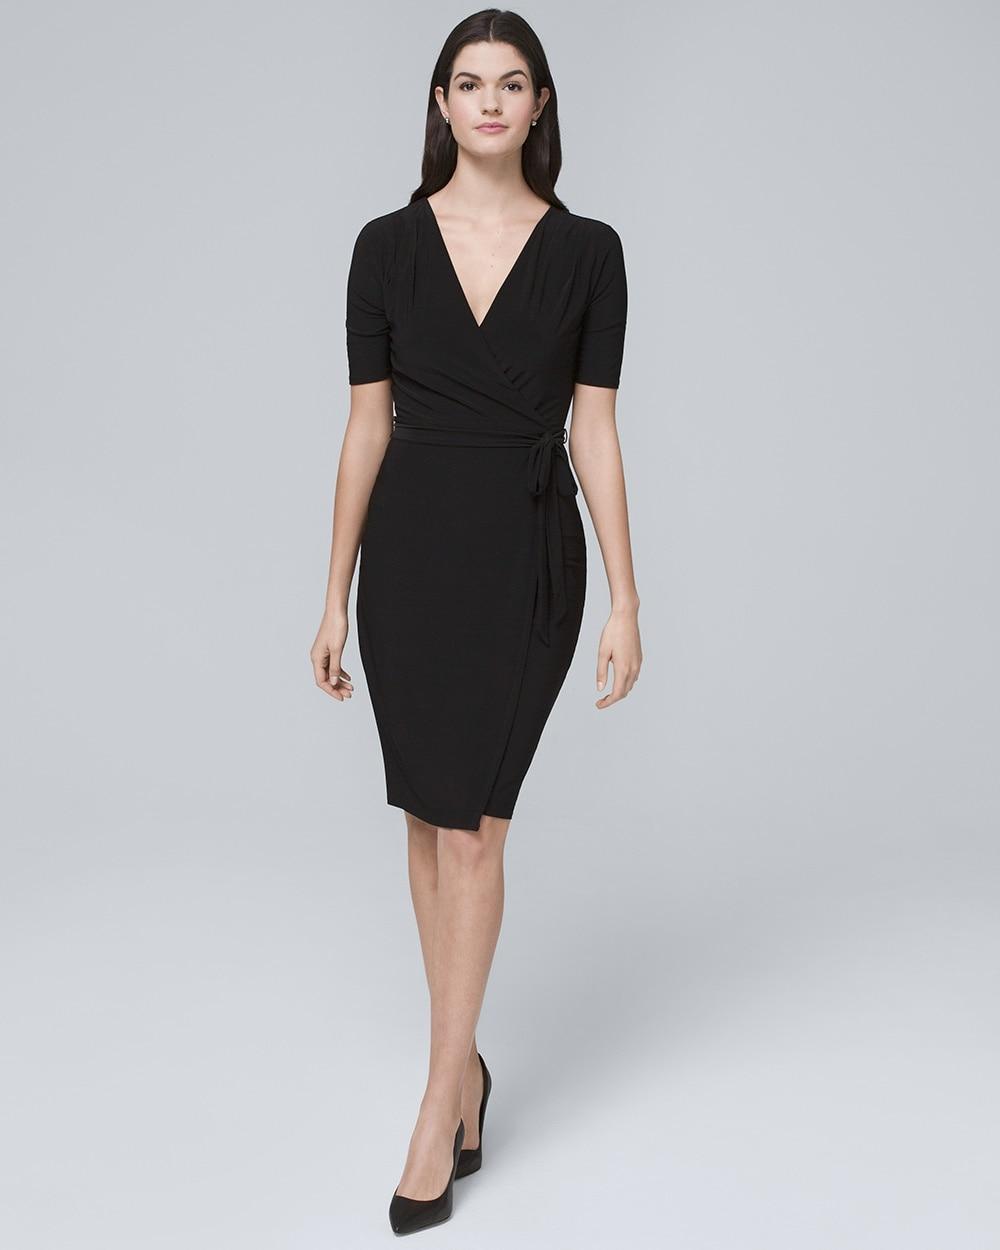 c40eecd29c7 Black Knit Wrap Dress - White House Black Market